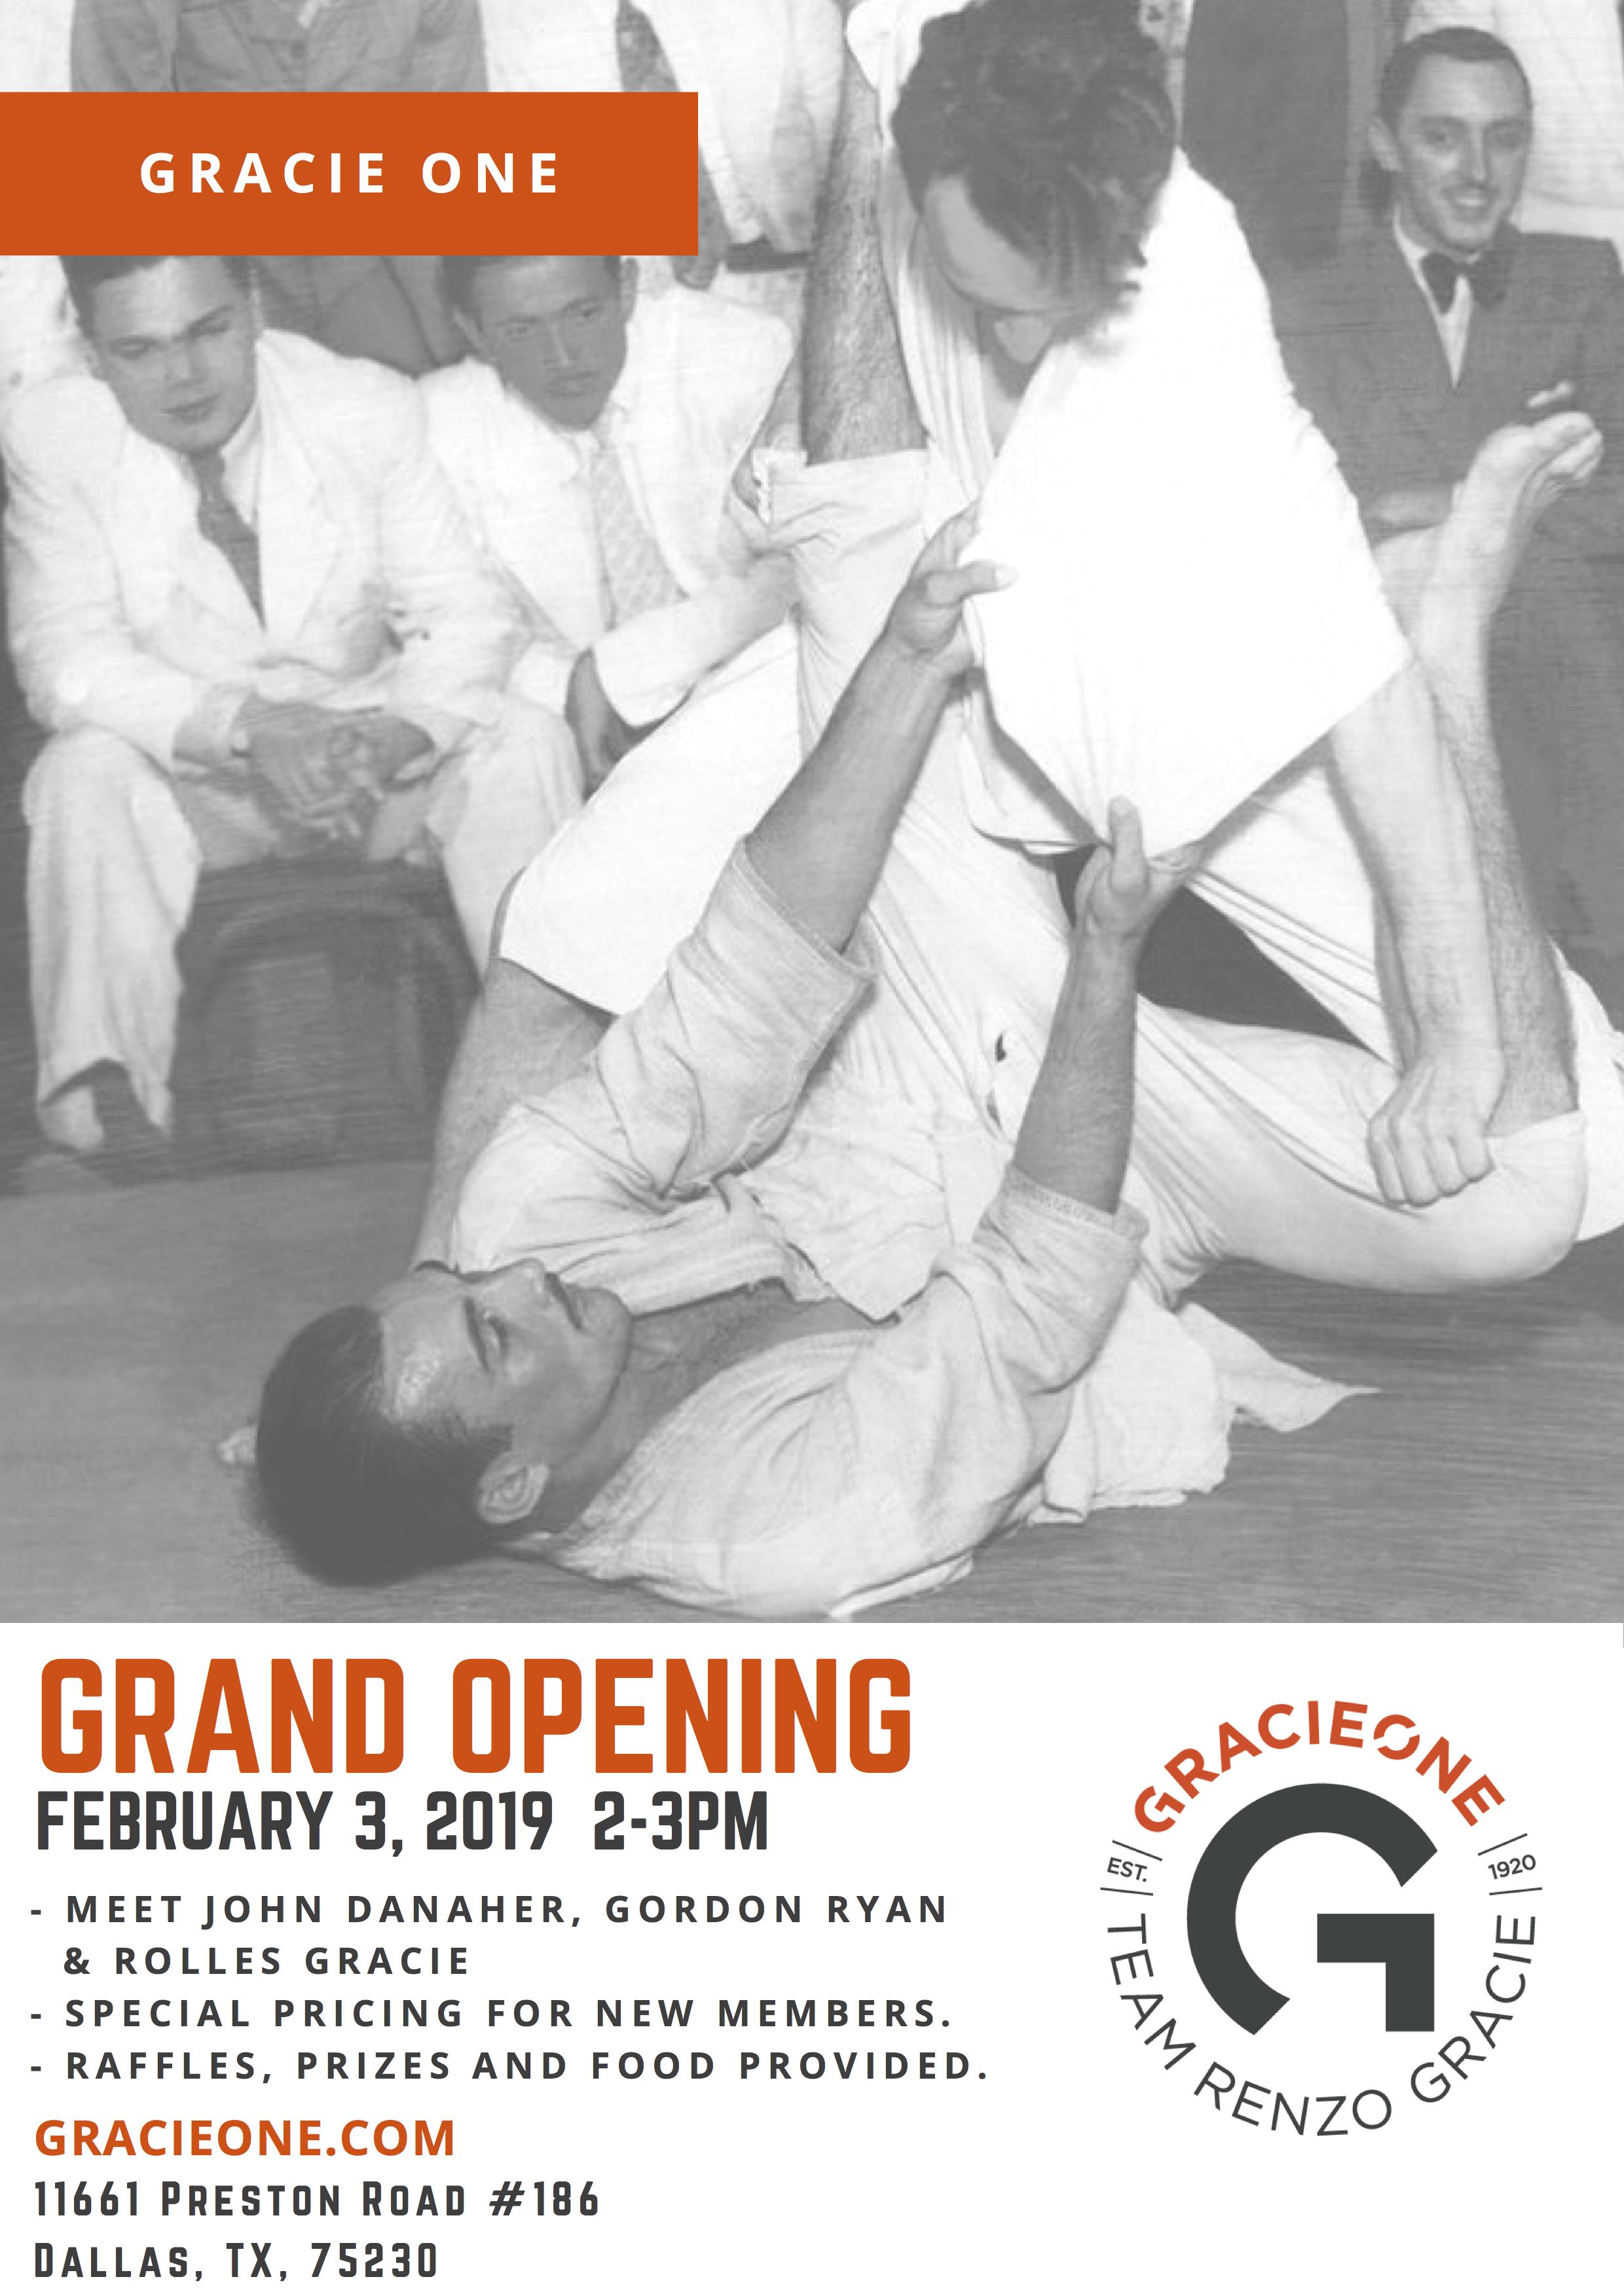 GracieOne Academy Grand Opening Carlos Gracie Sr.